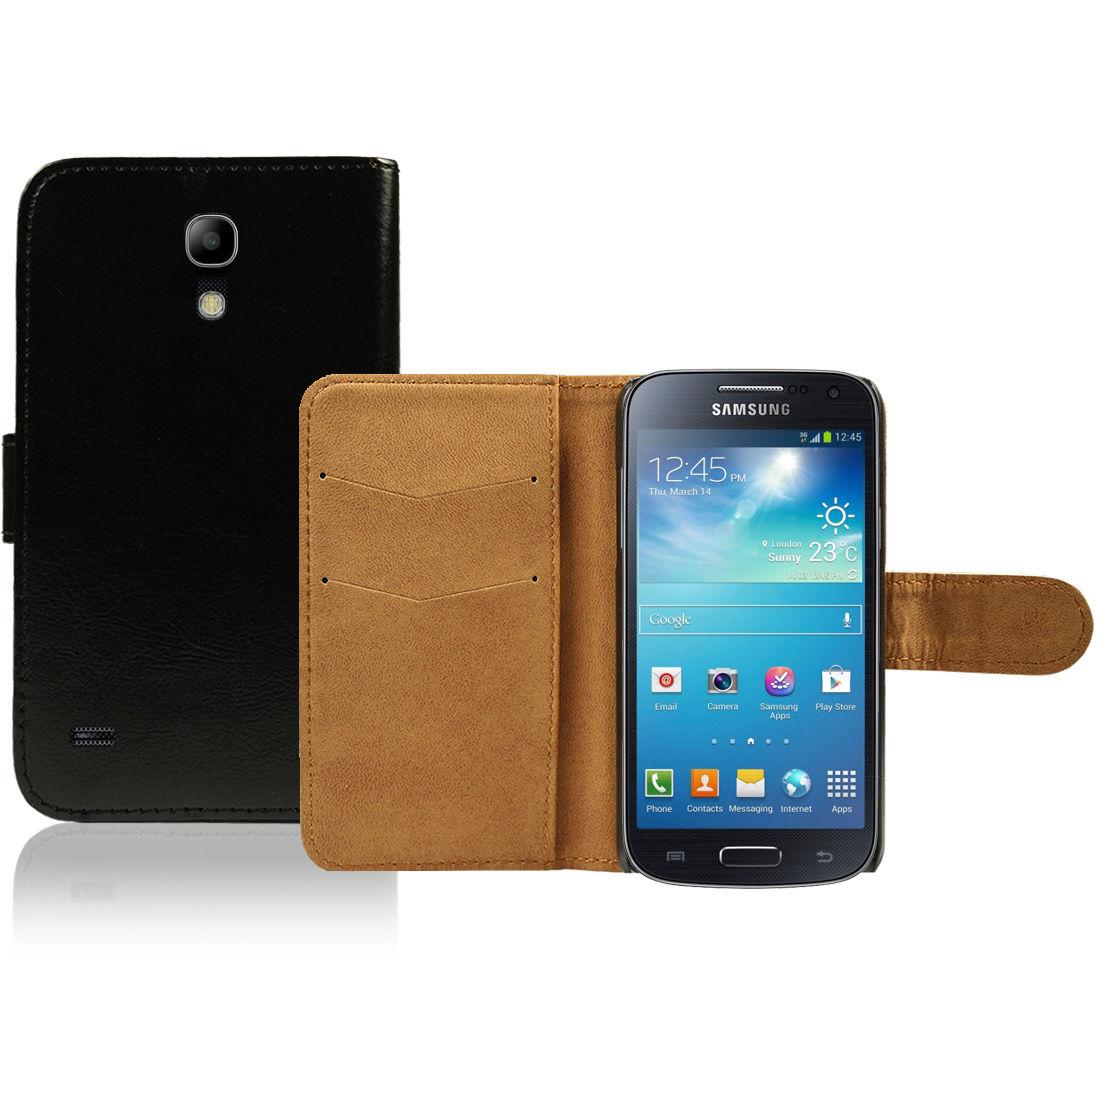 Pouzdro pro Samsung Galaxy S4 Mini černé